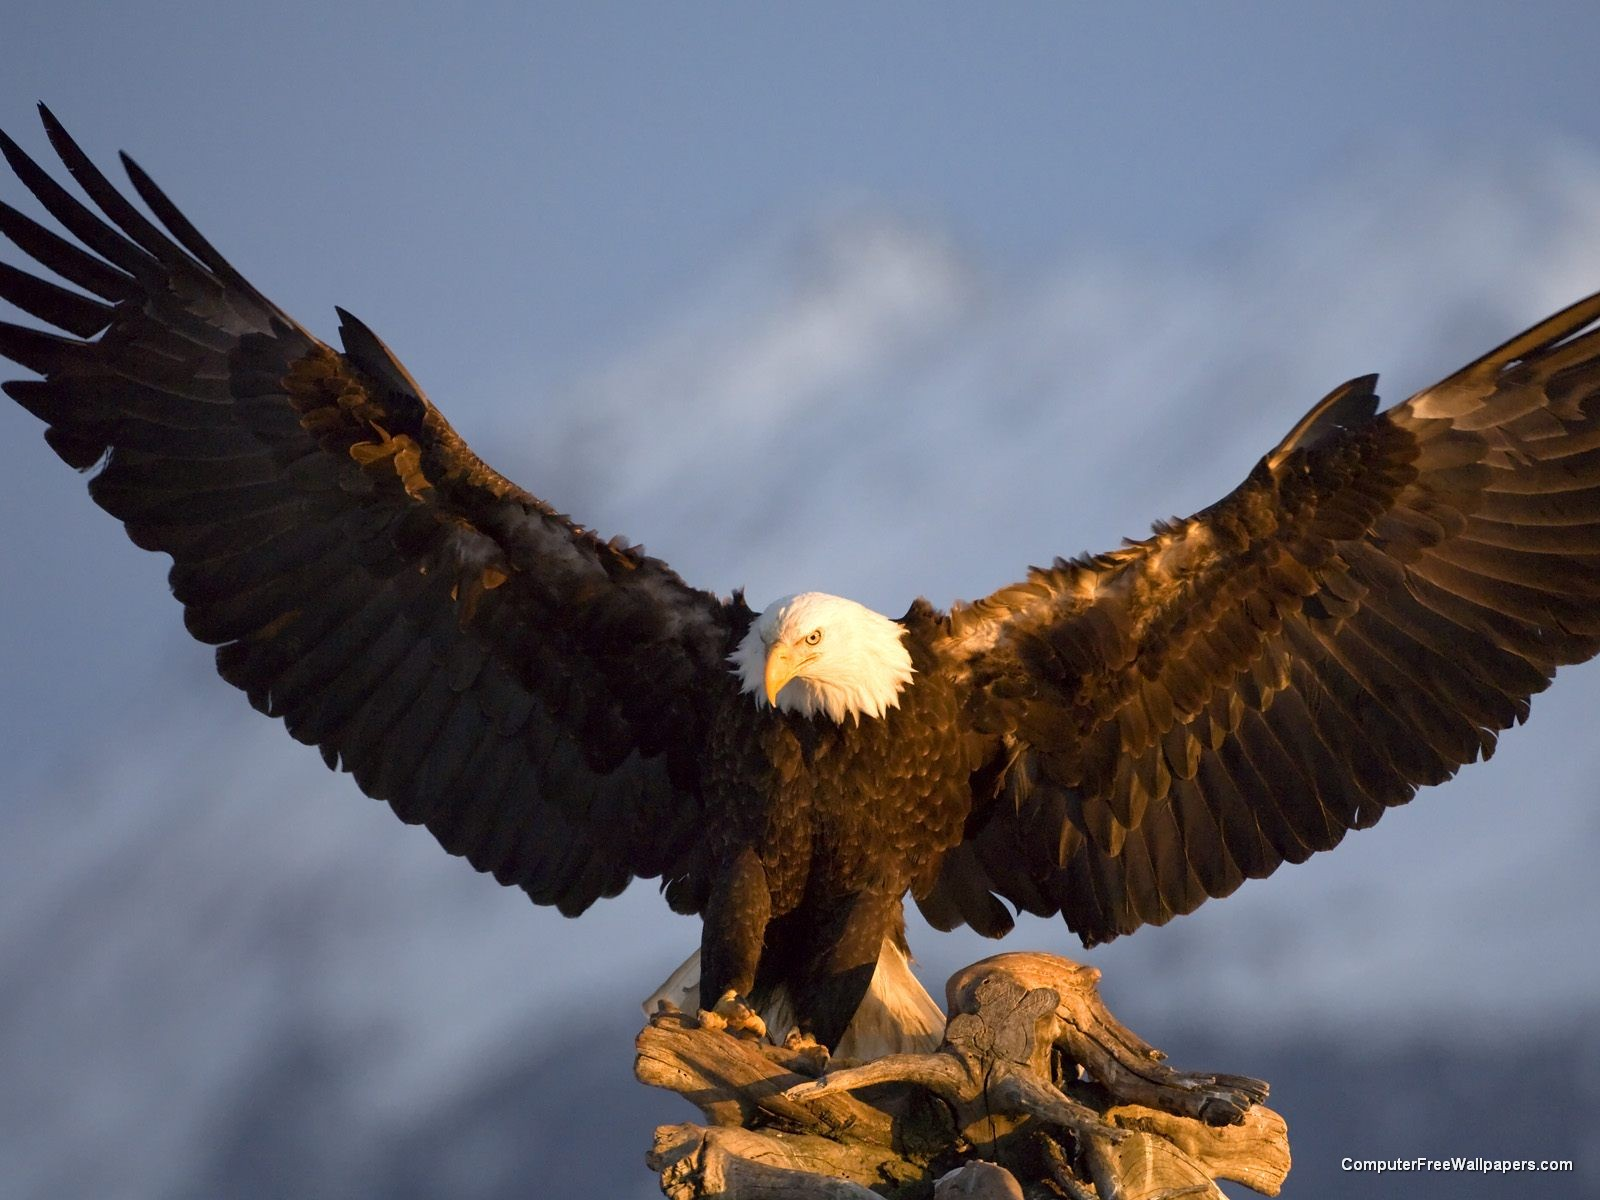 http://1.bp.blogspot.com/-bgMwOsMinto/T9Av2tSsBCI/AAAAAAAAB6k/_st1V-C0uyo/s1600/bald-eagle.jpeg